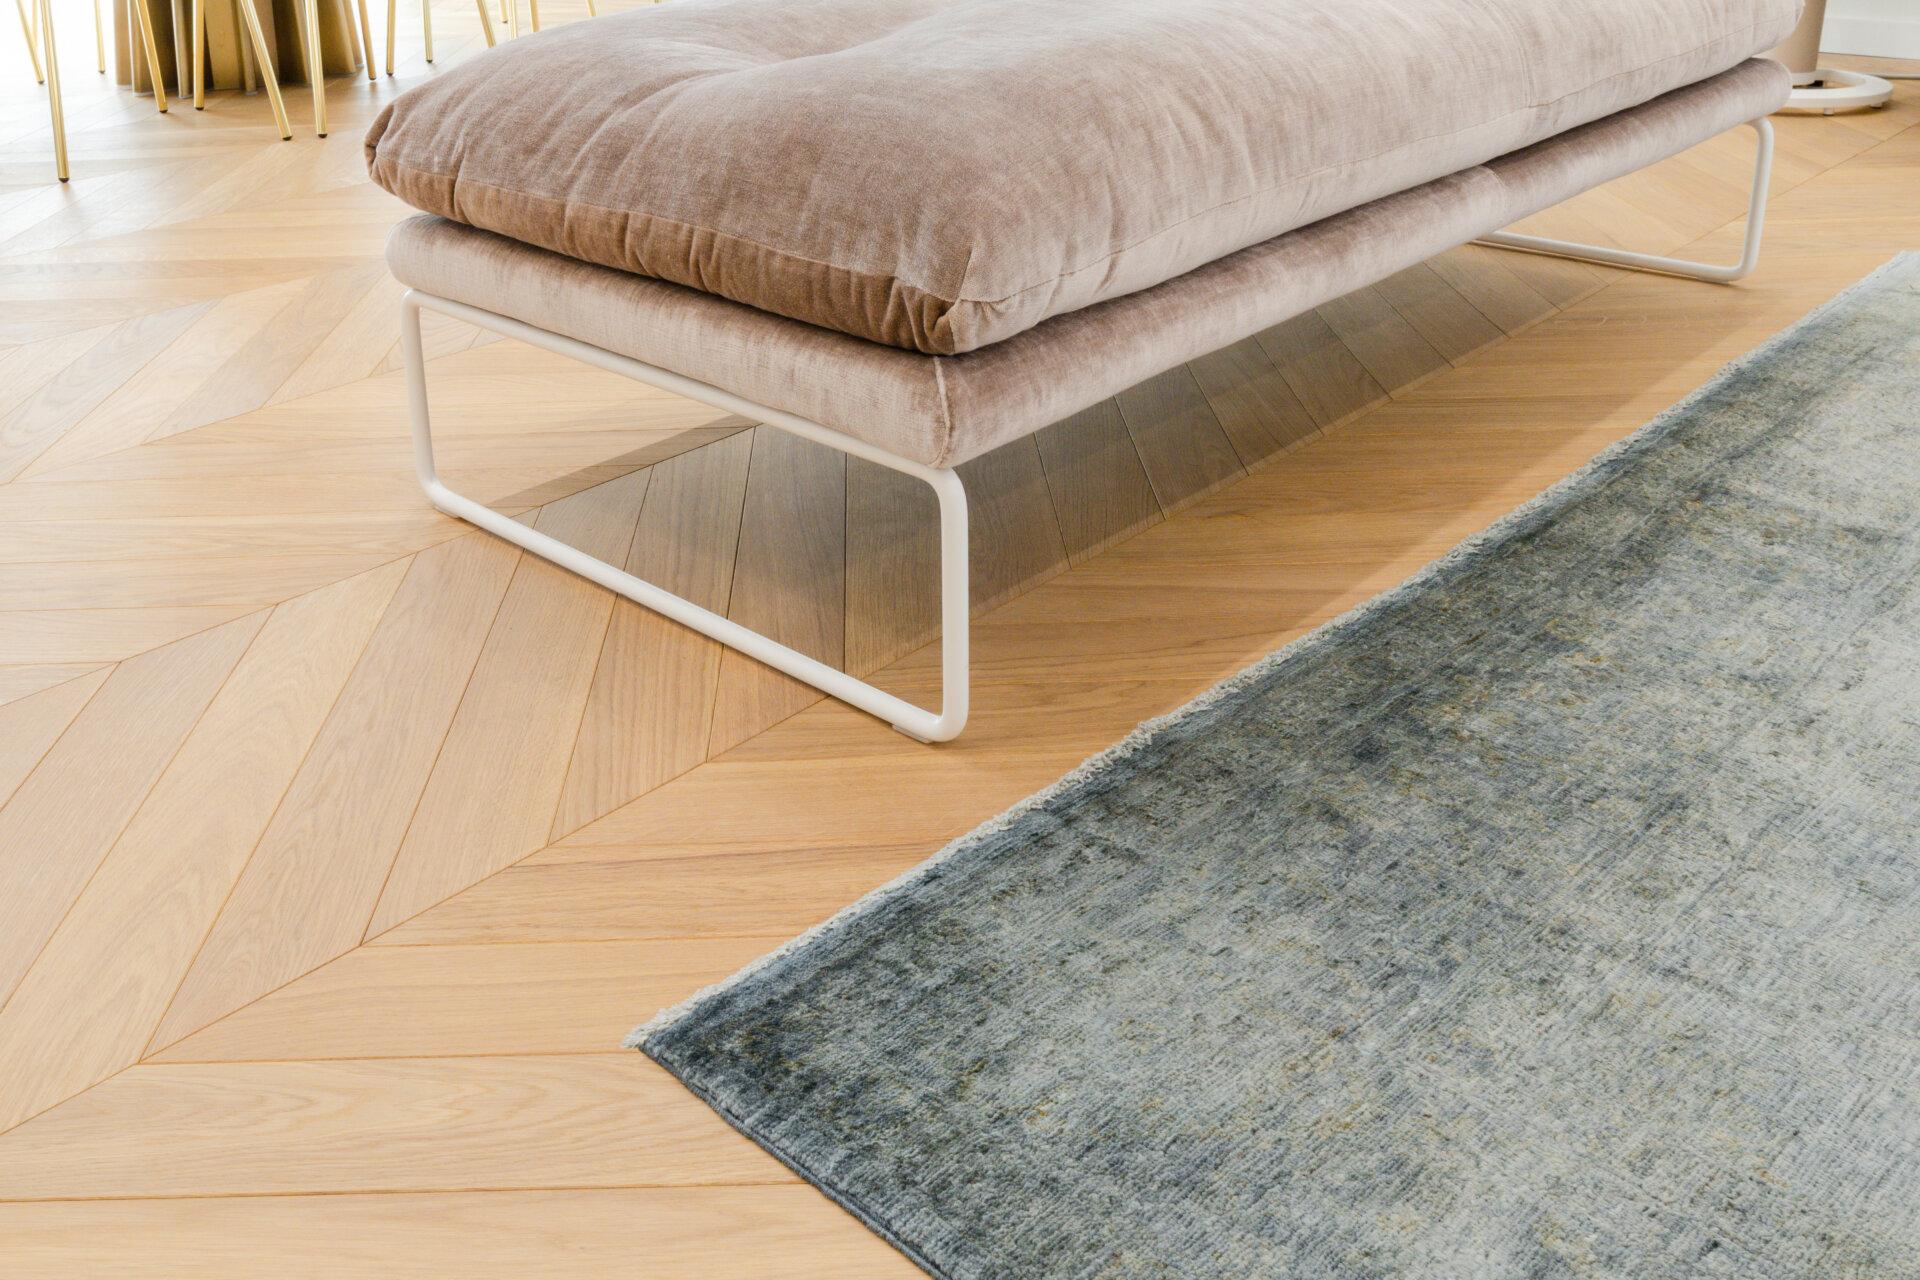 20210303-carpet&more-vila-bogdan-craiova-by-hugmedia-15